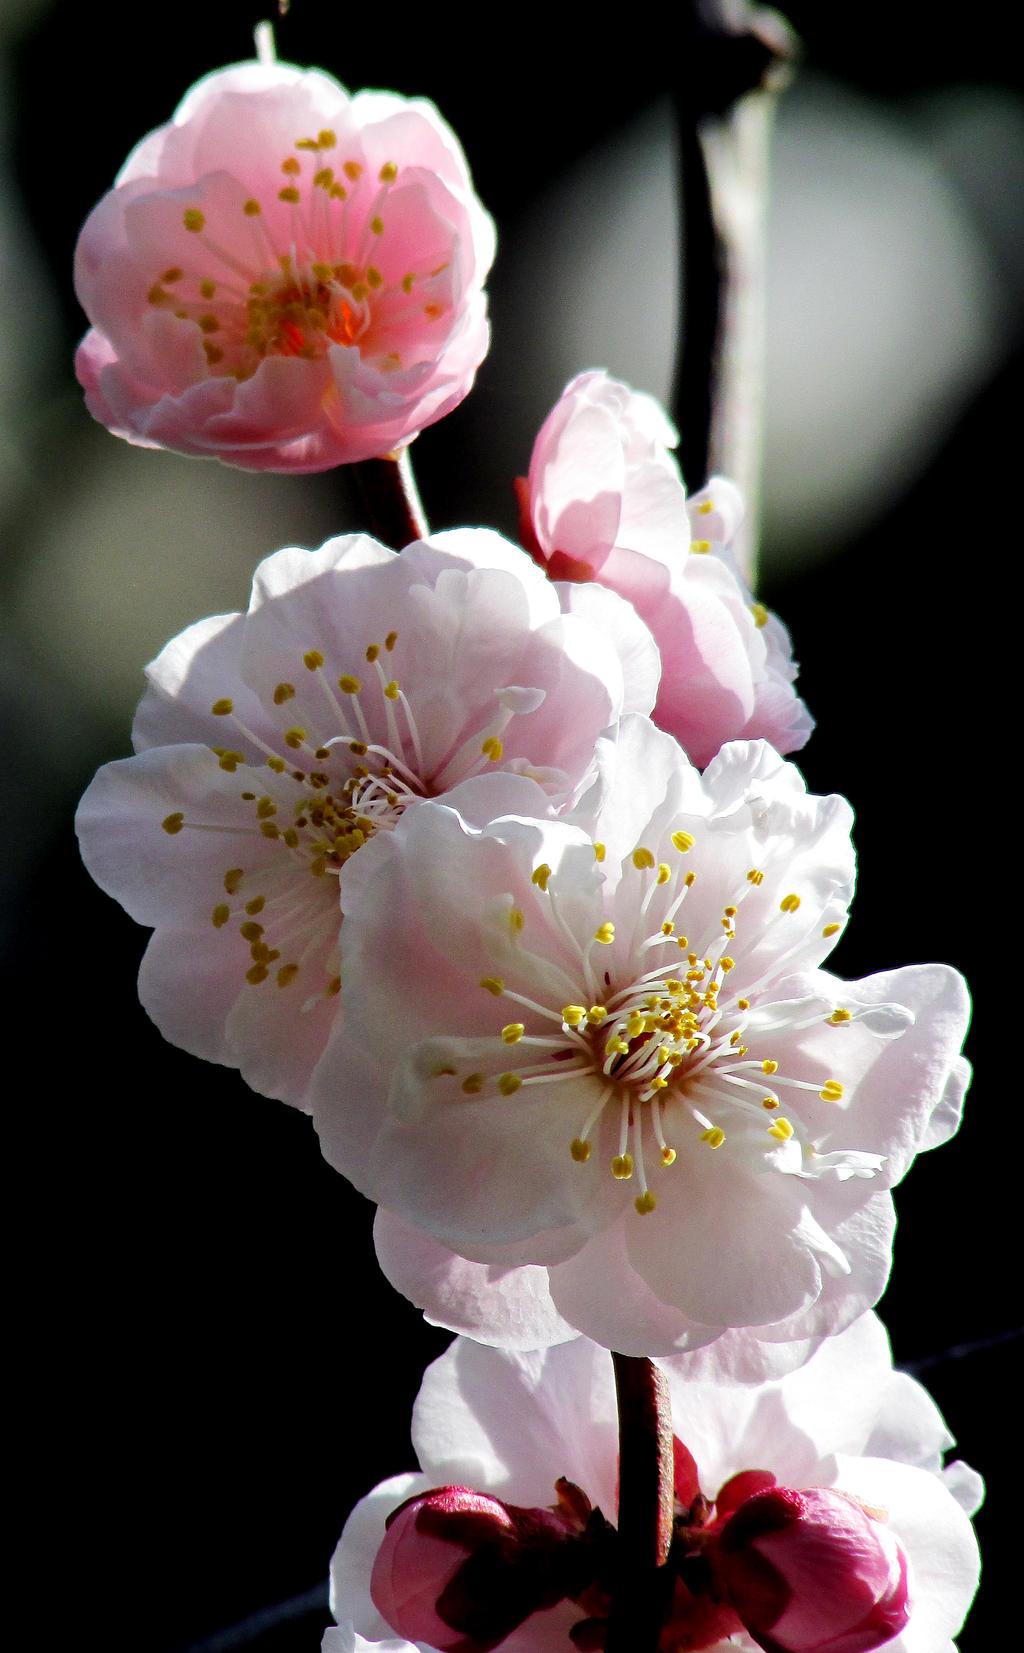 Plum blossom in tokyo by kitsune89